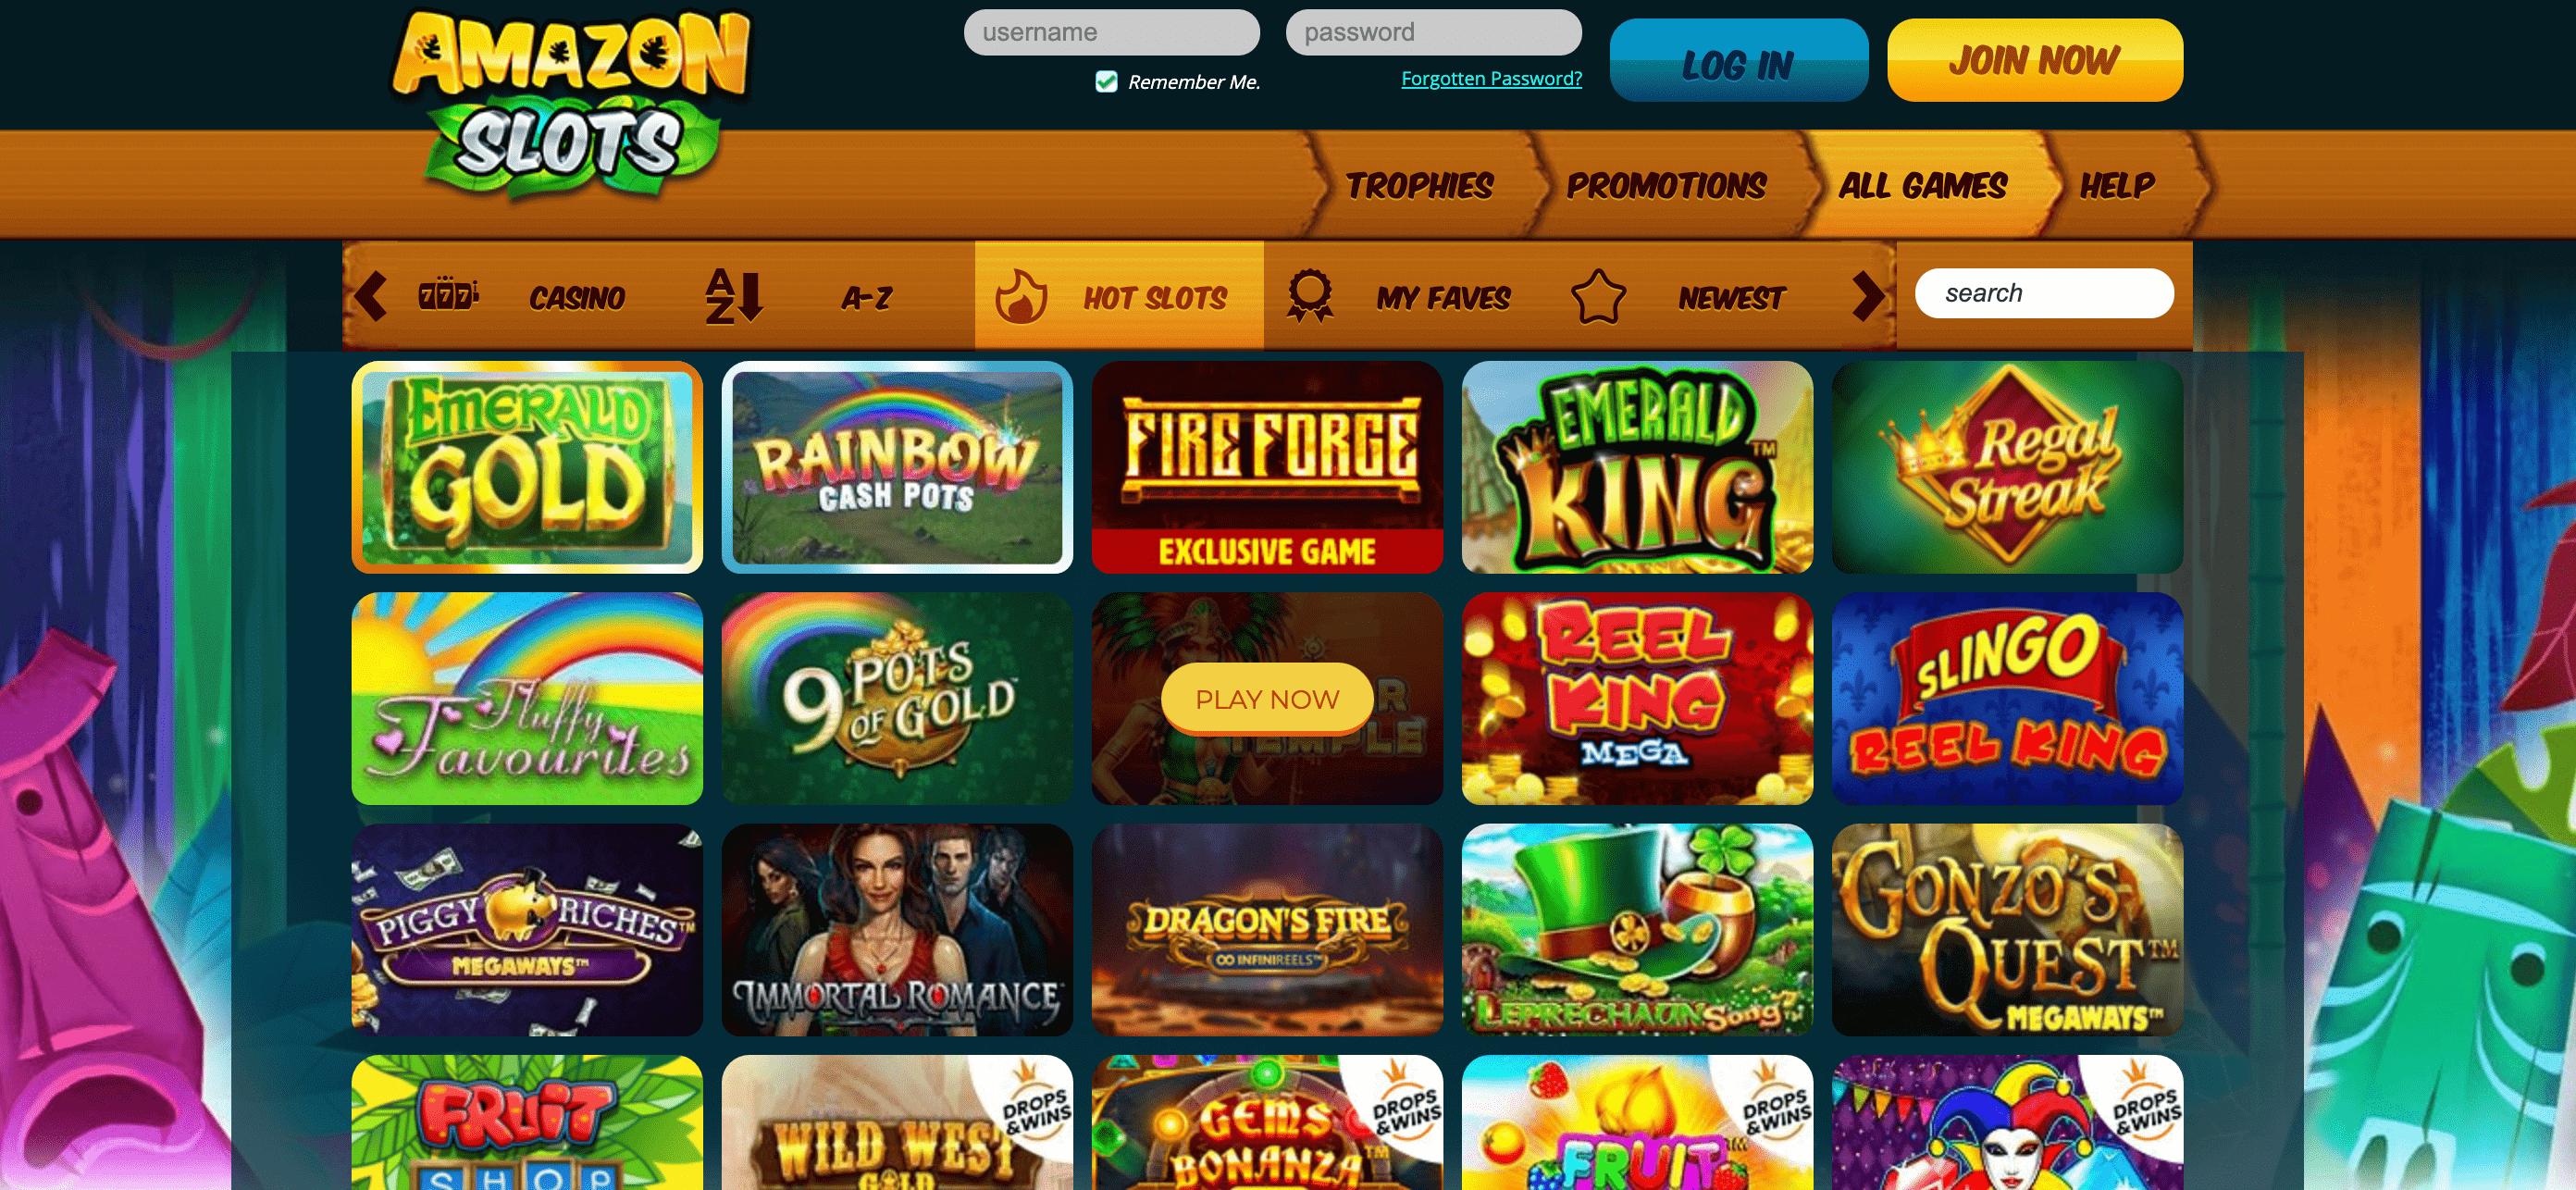 amazon slot games